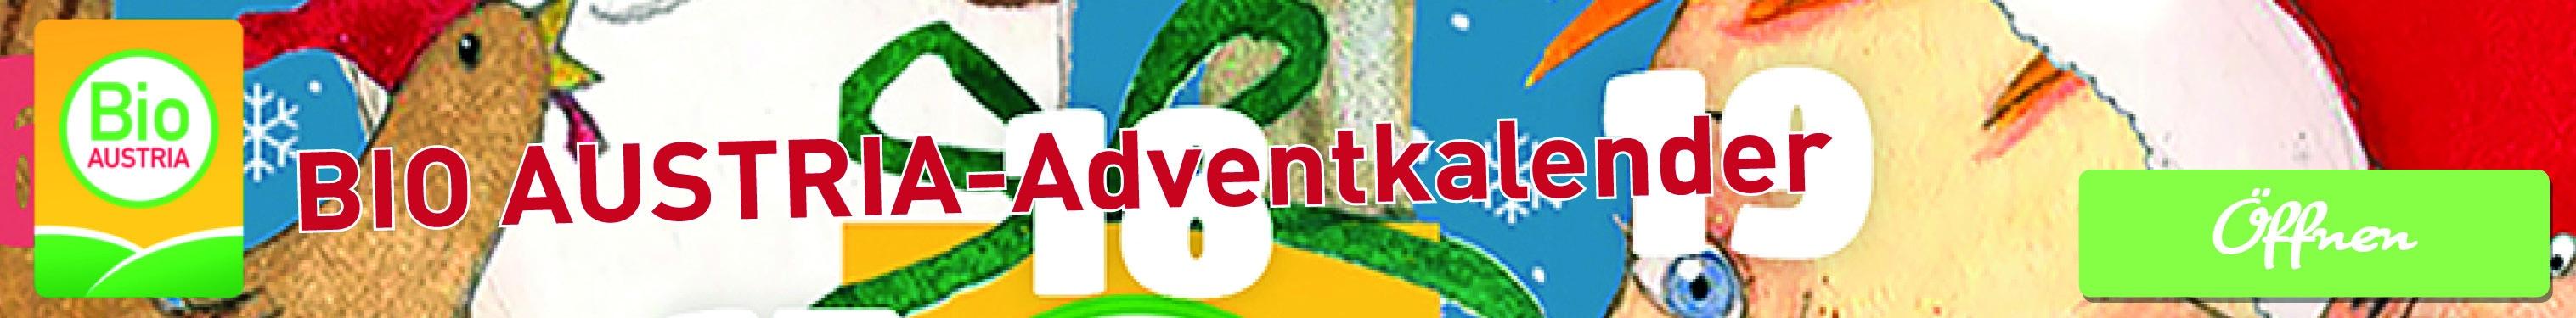 BIO AUSTRIA Adventkalender